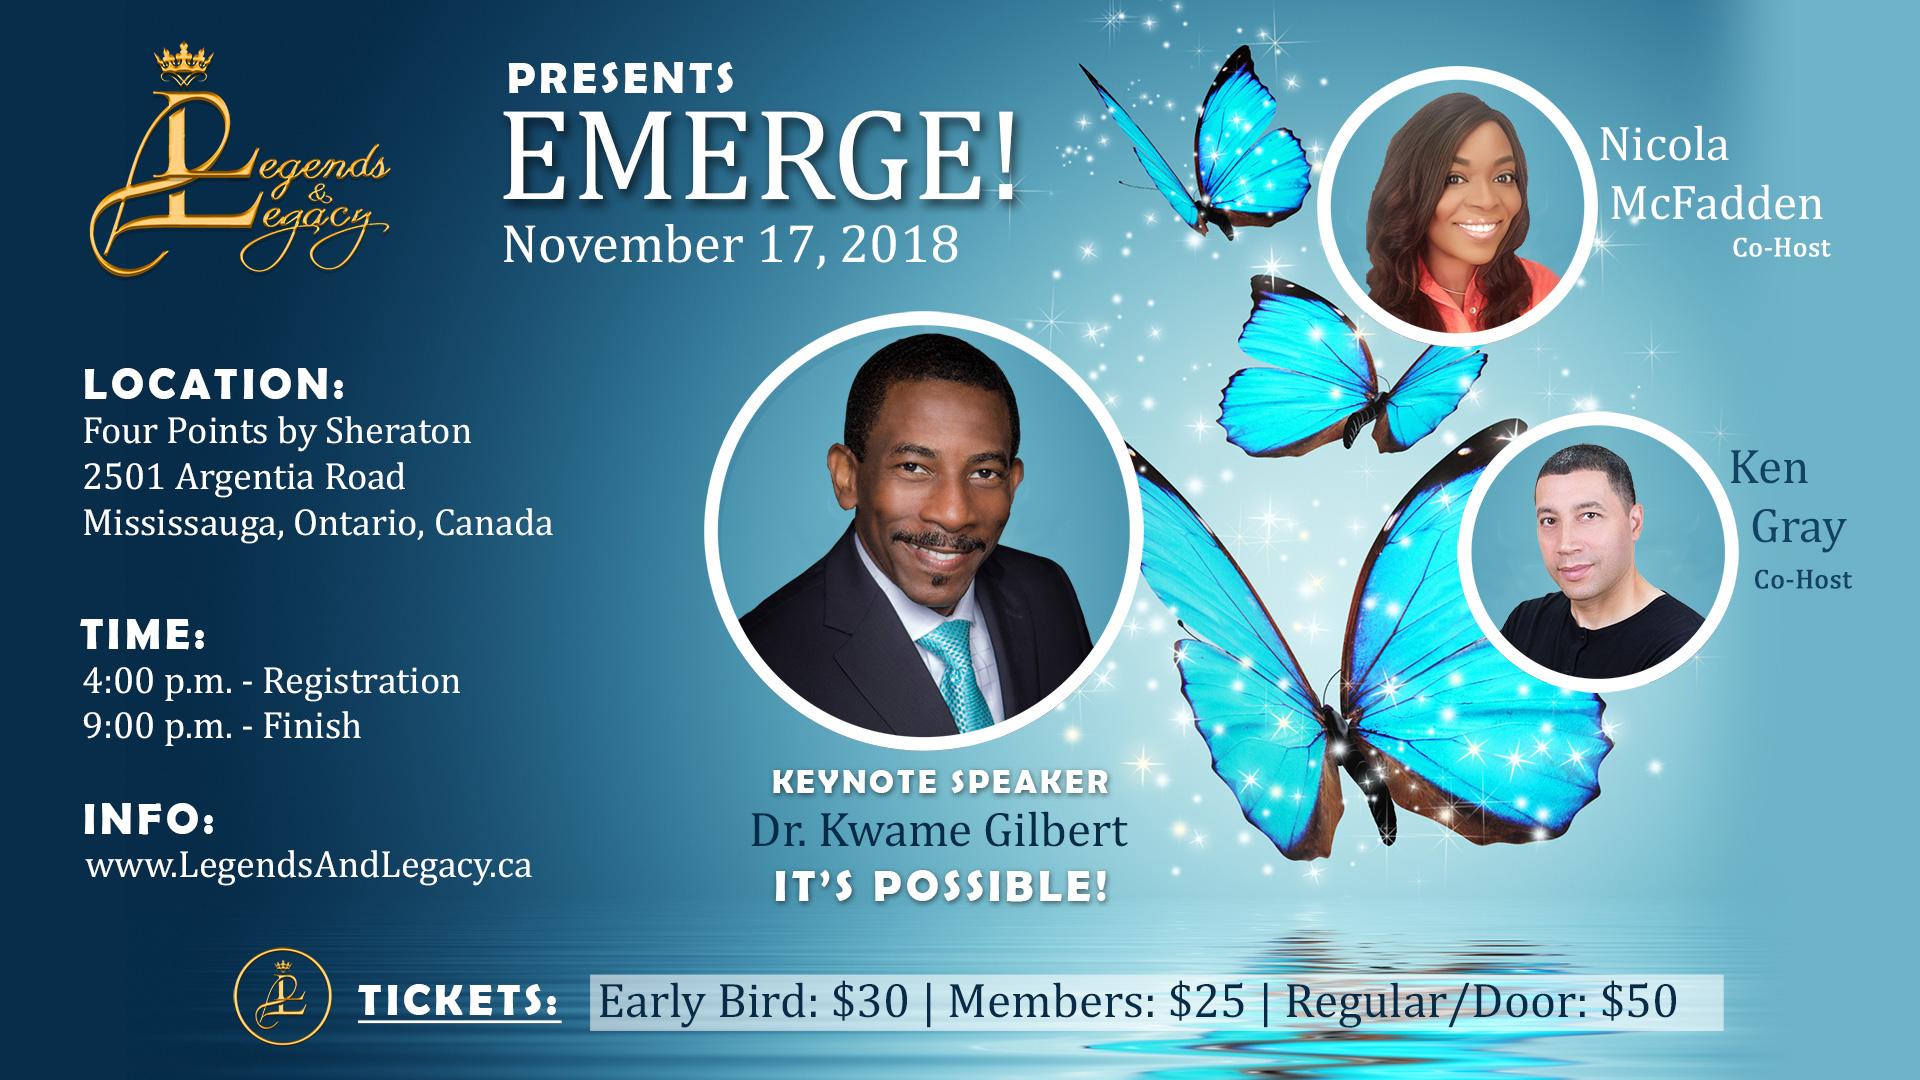 emerge-flyer-facebook.jpg